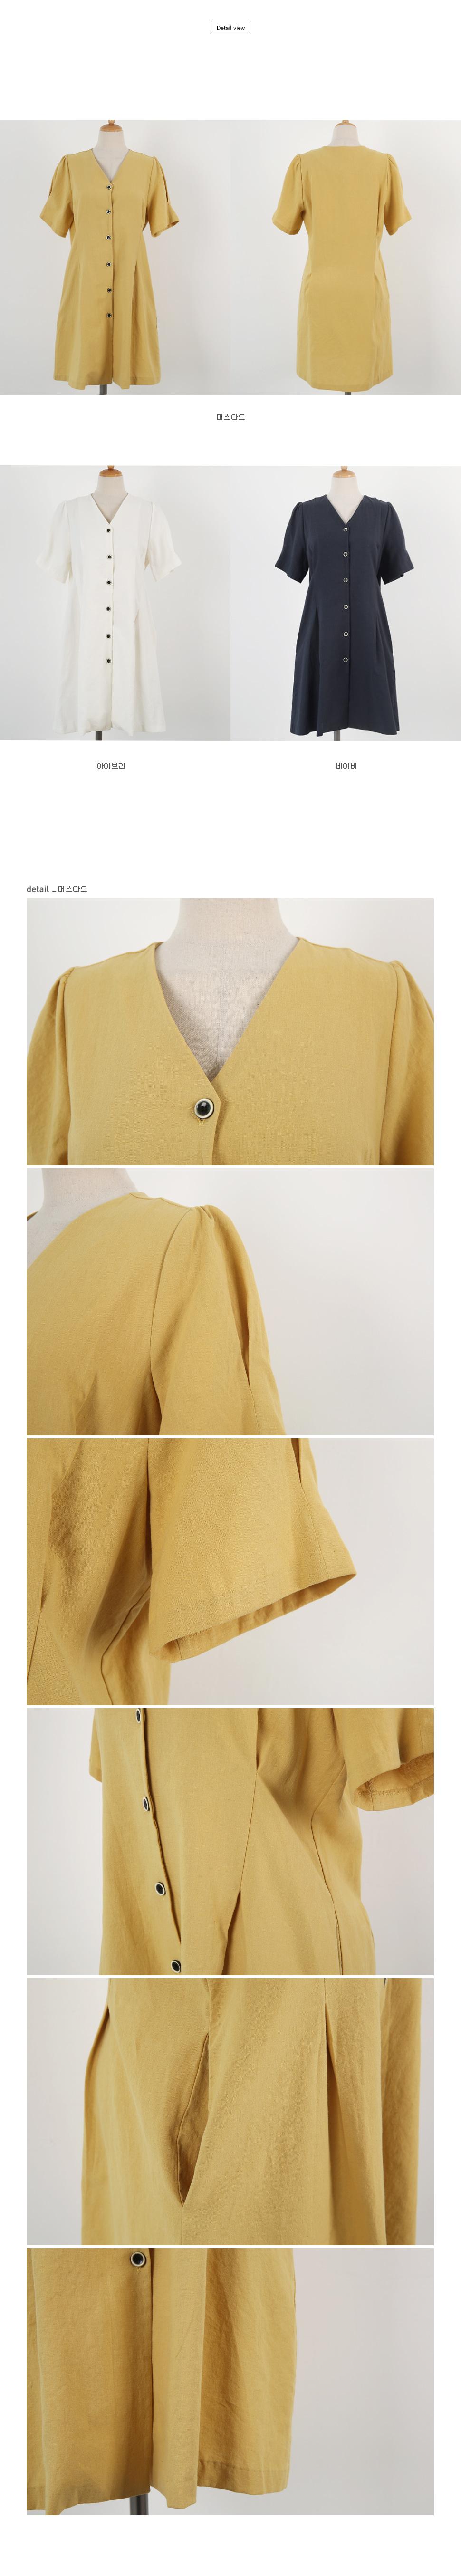 Pounded linen mini dress